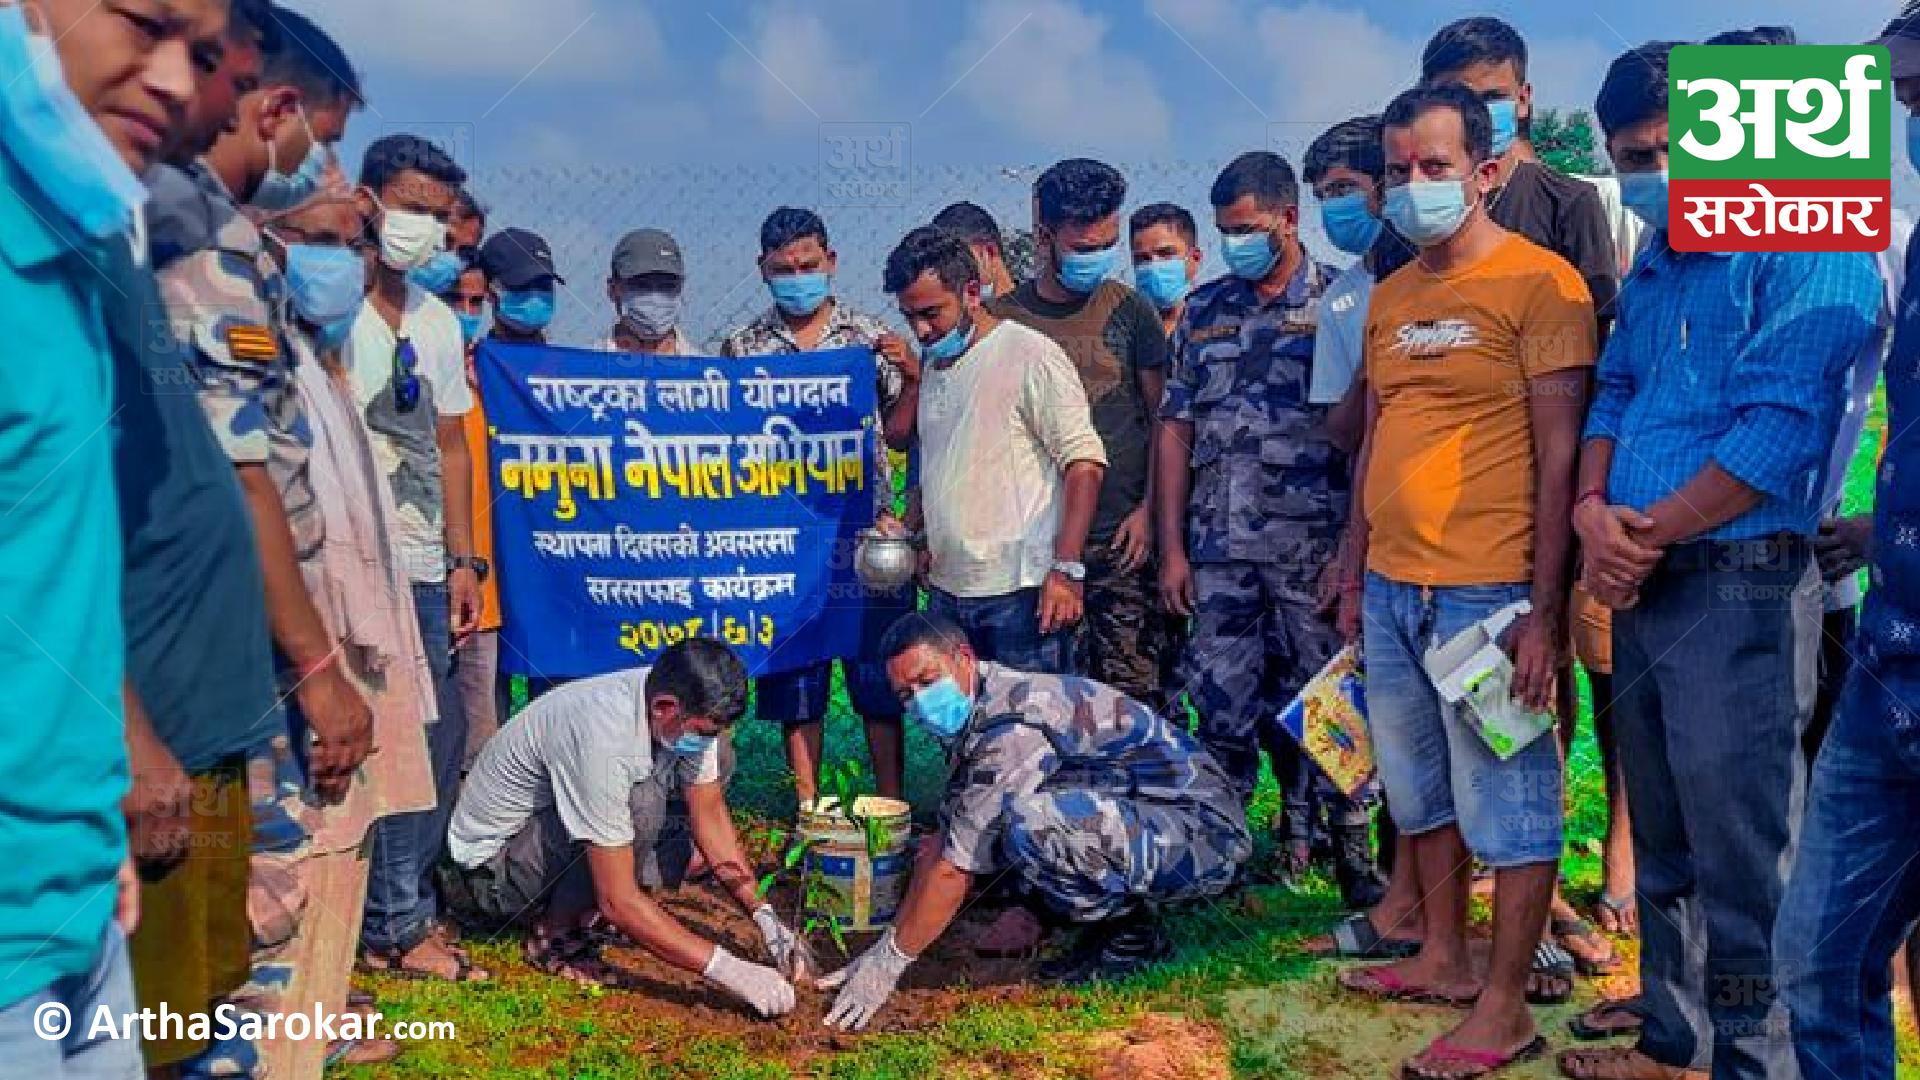 परिवर्तनका लागि 'नमुना नेपाल अभियान'